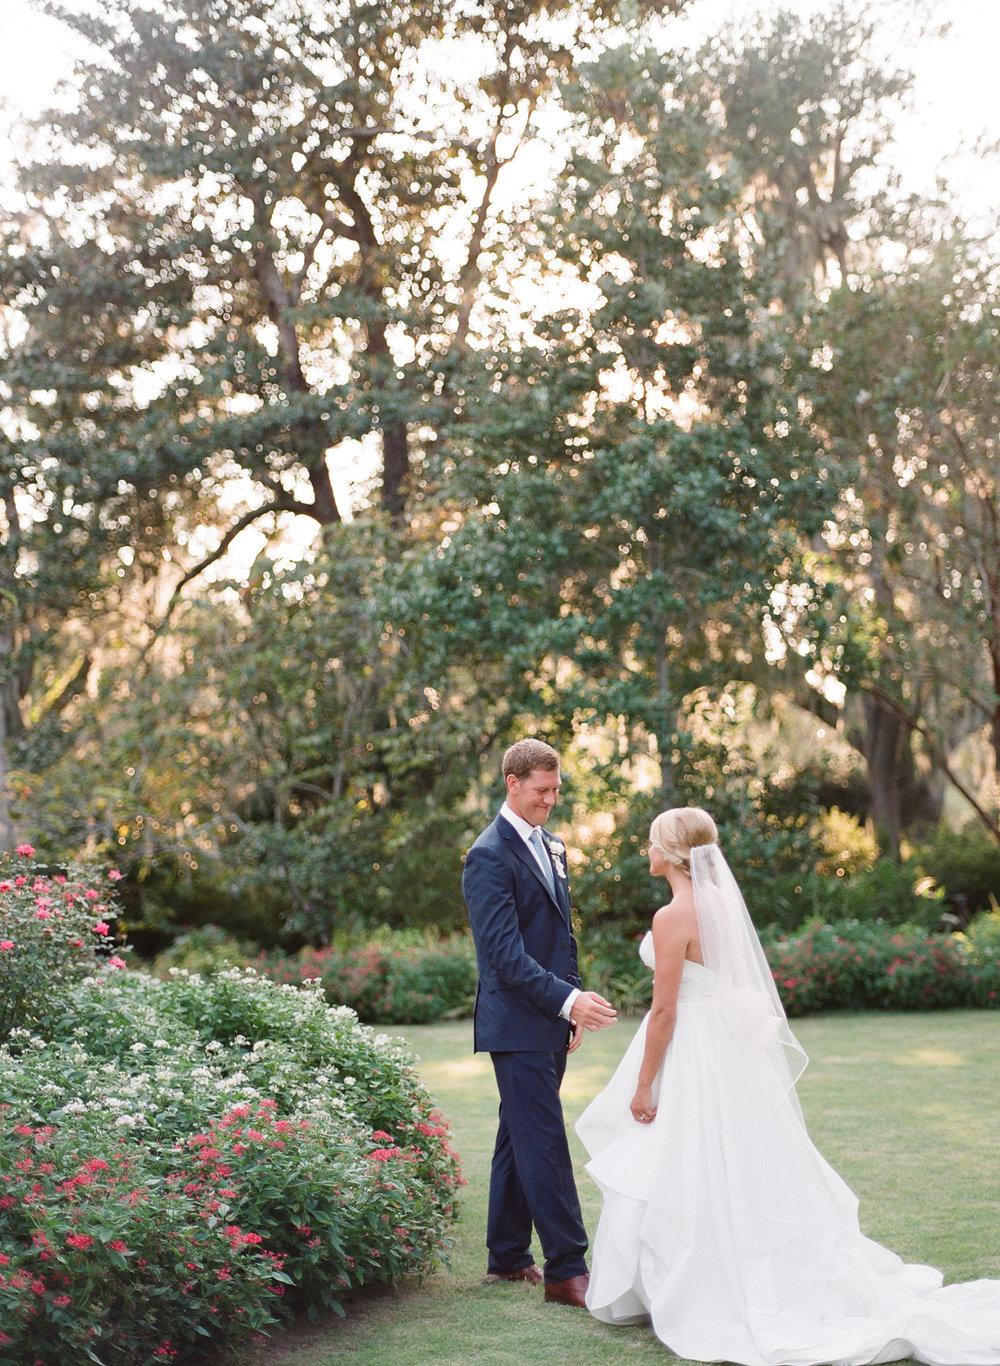 Airlie-Gardens-Wedding-46.jpg